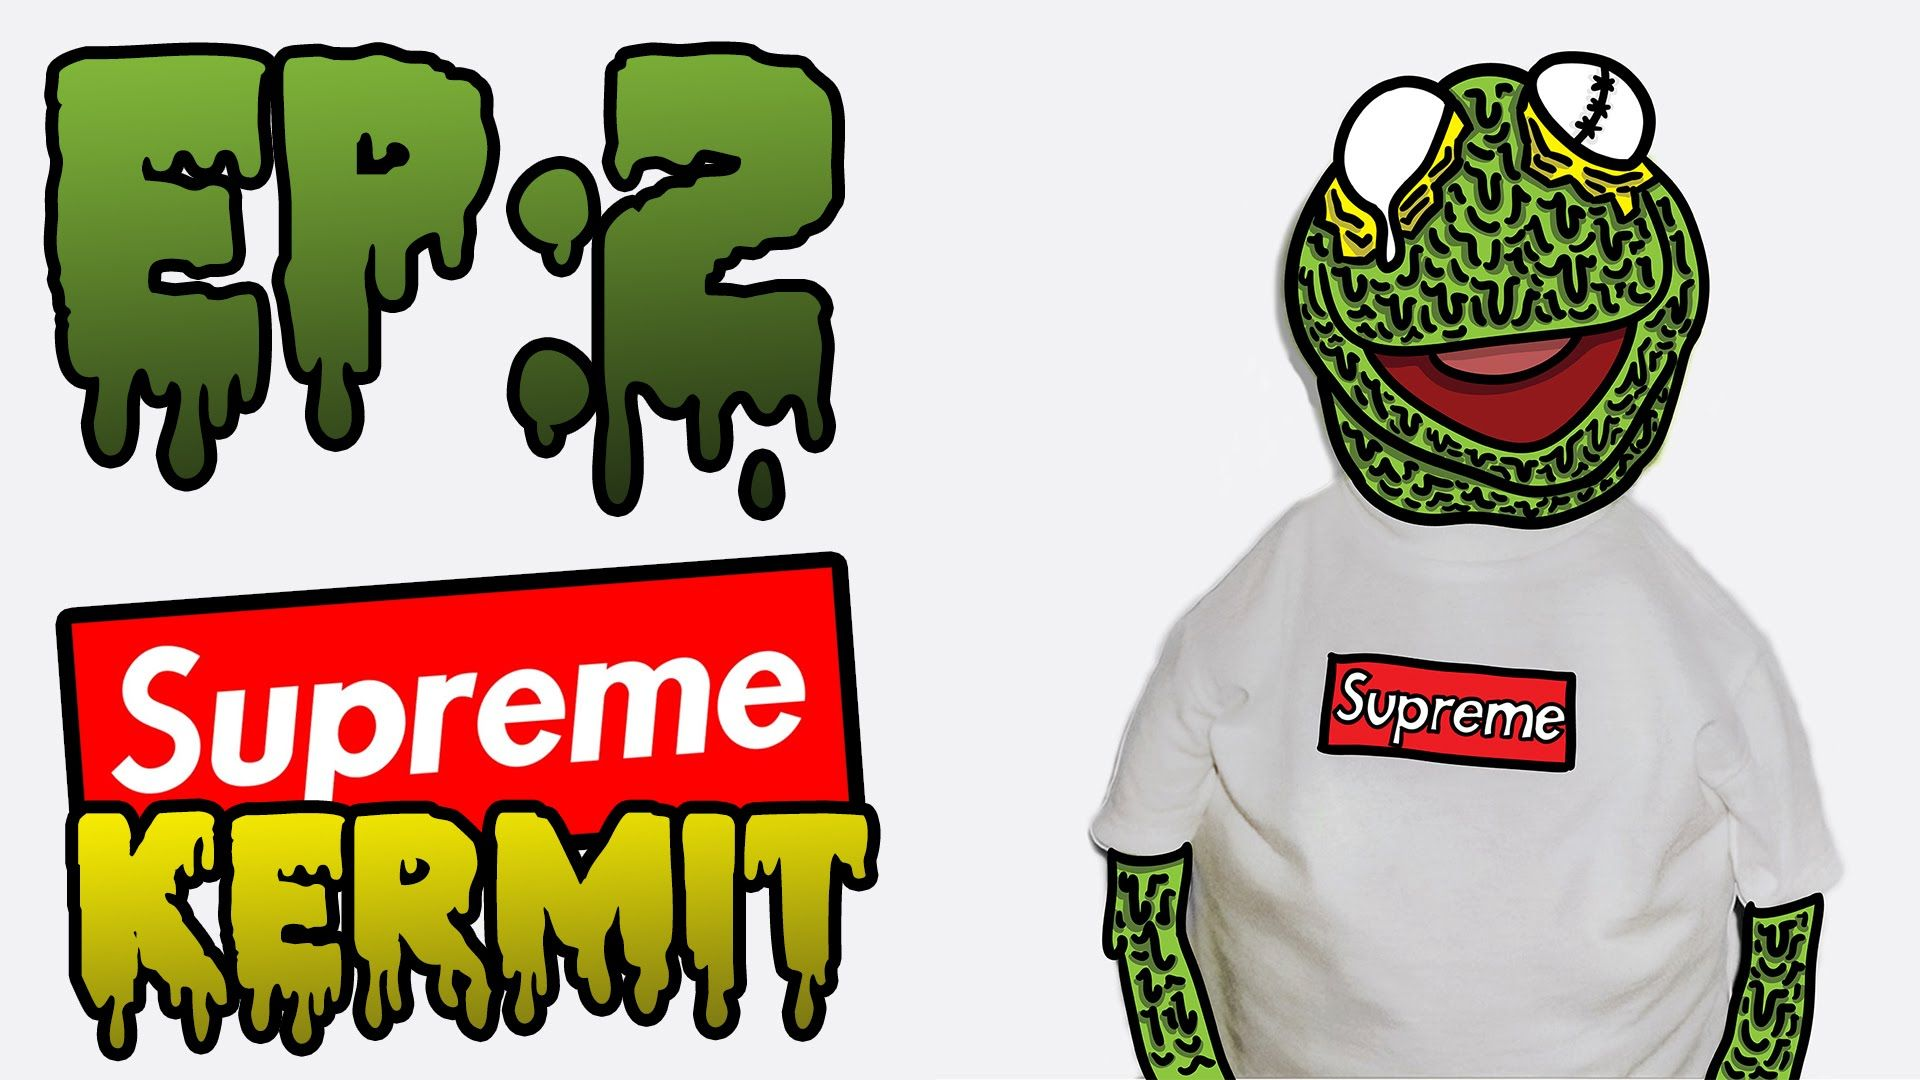 Supreme Kermit Wallpapers Top Free Supreme Kermit Backgrounds